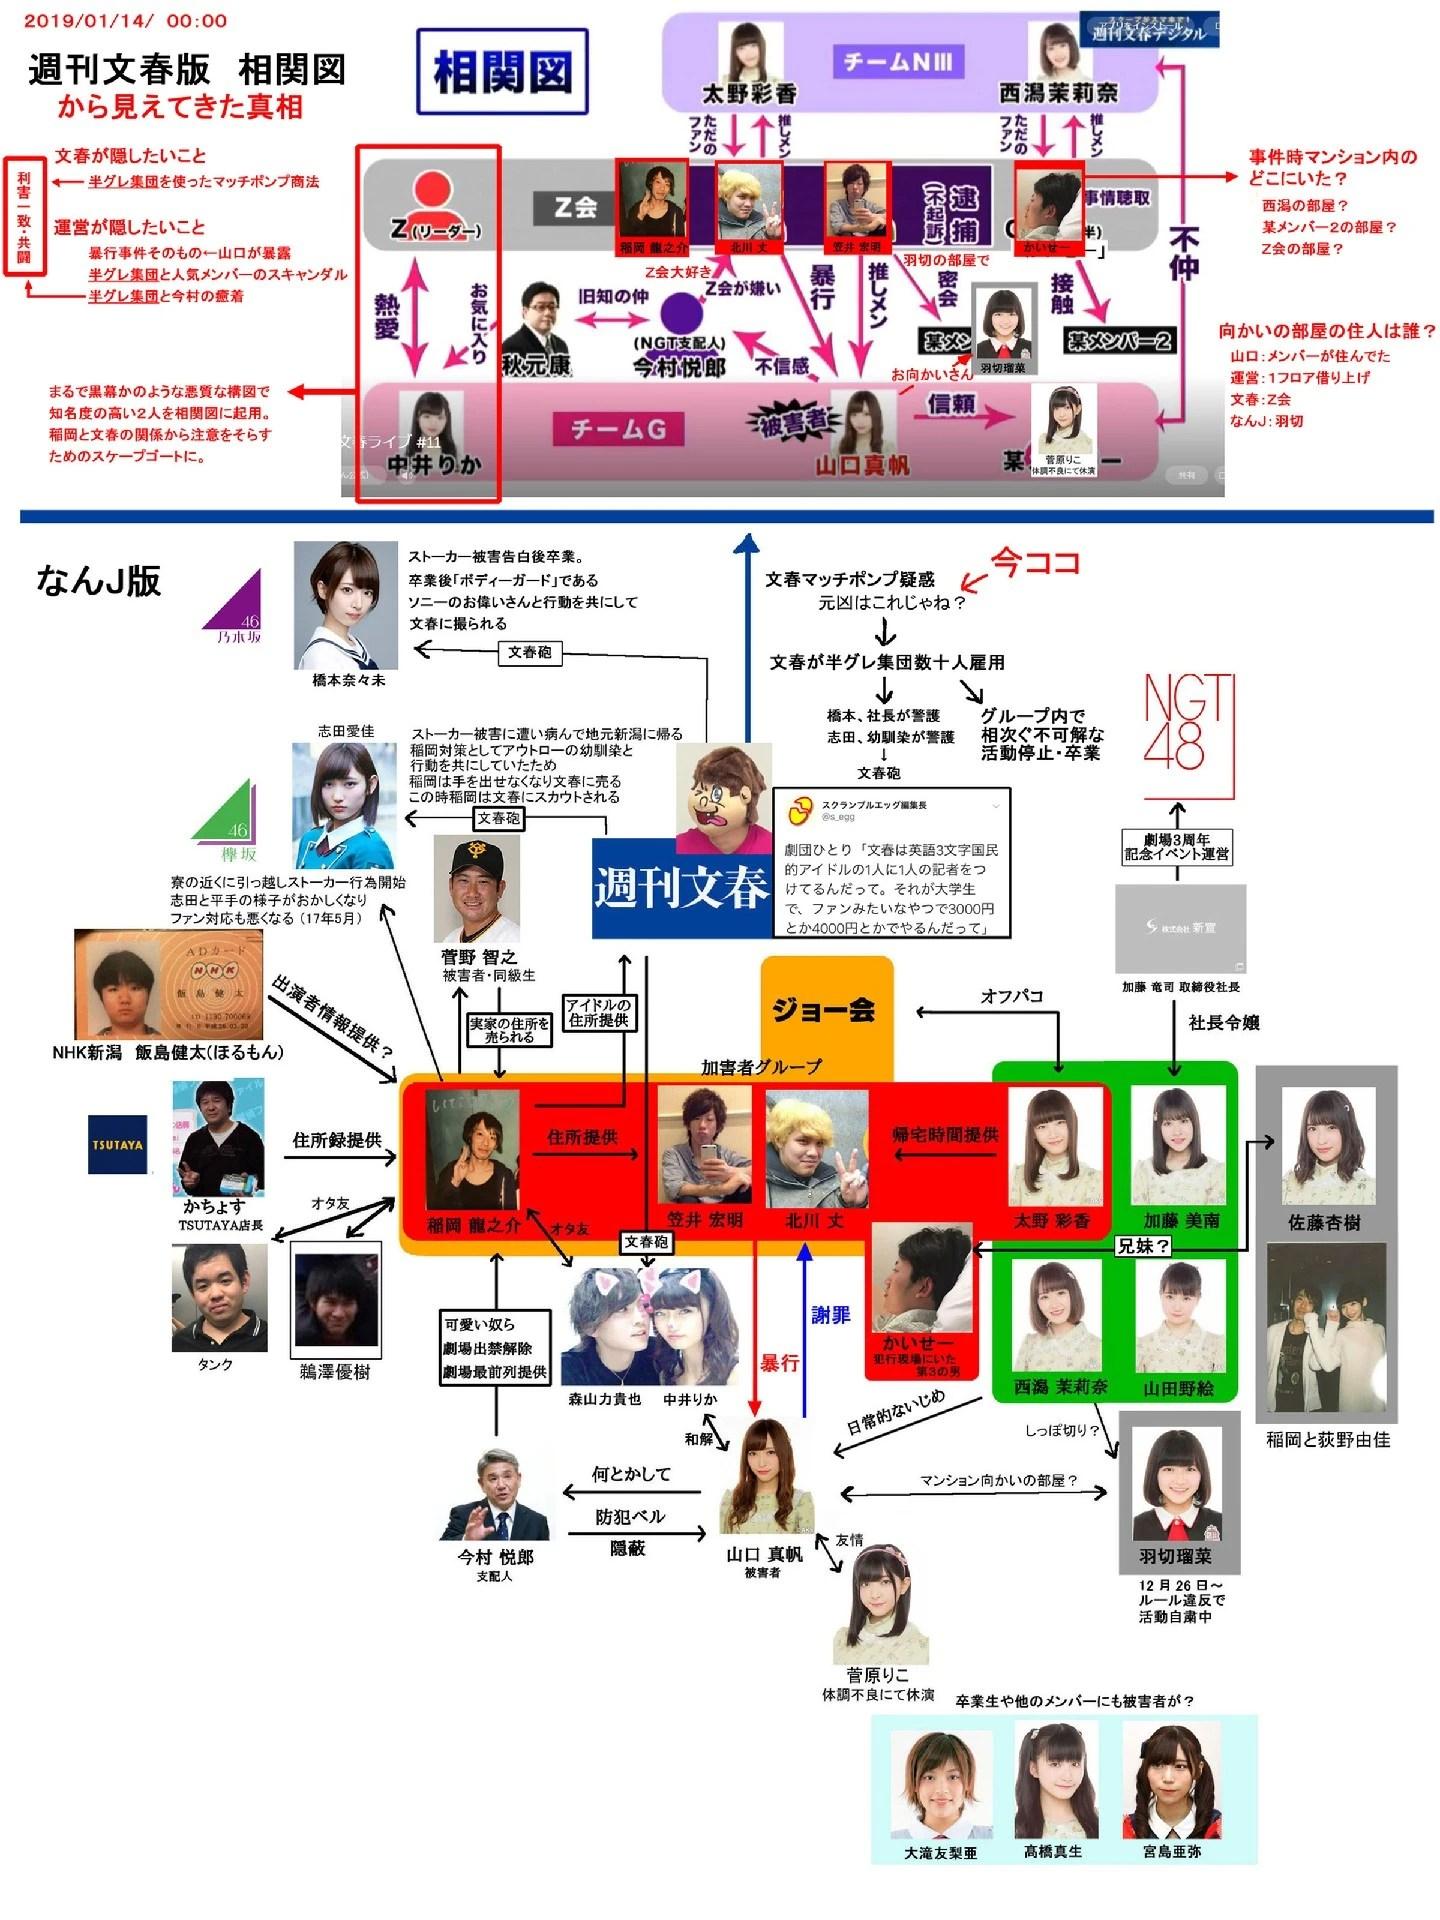 https://i1.wp.com/blogimg.goo.ne.jp/user_image/54/3d/888f31a31ab80915f29de6efddaf63f3.jpg